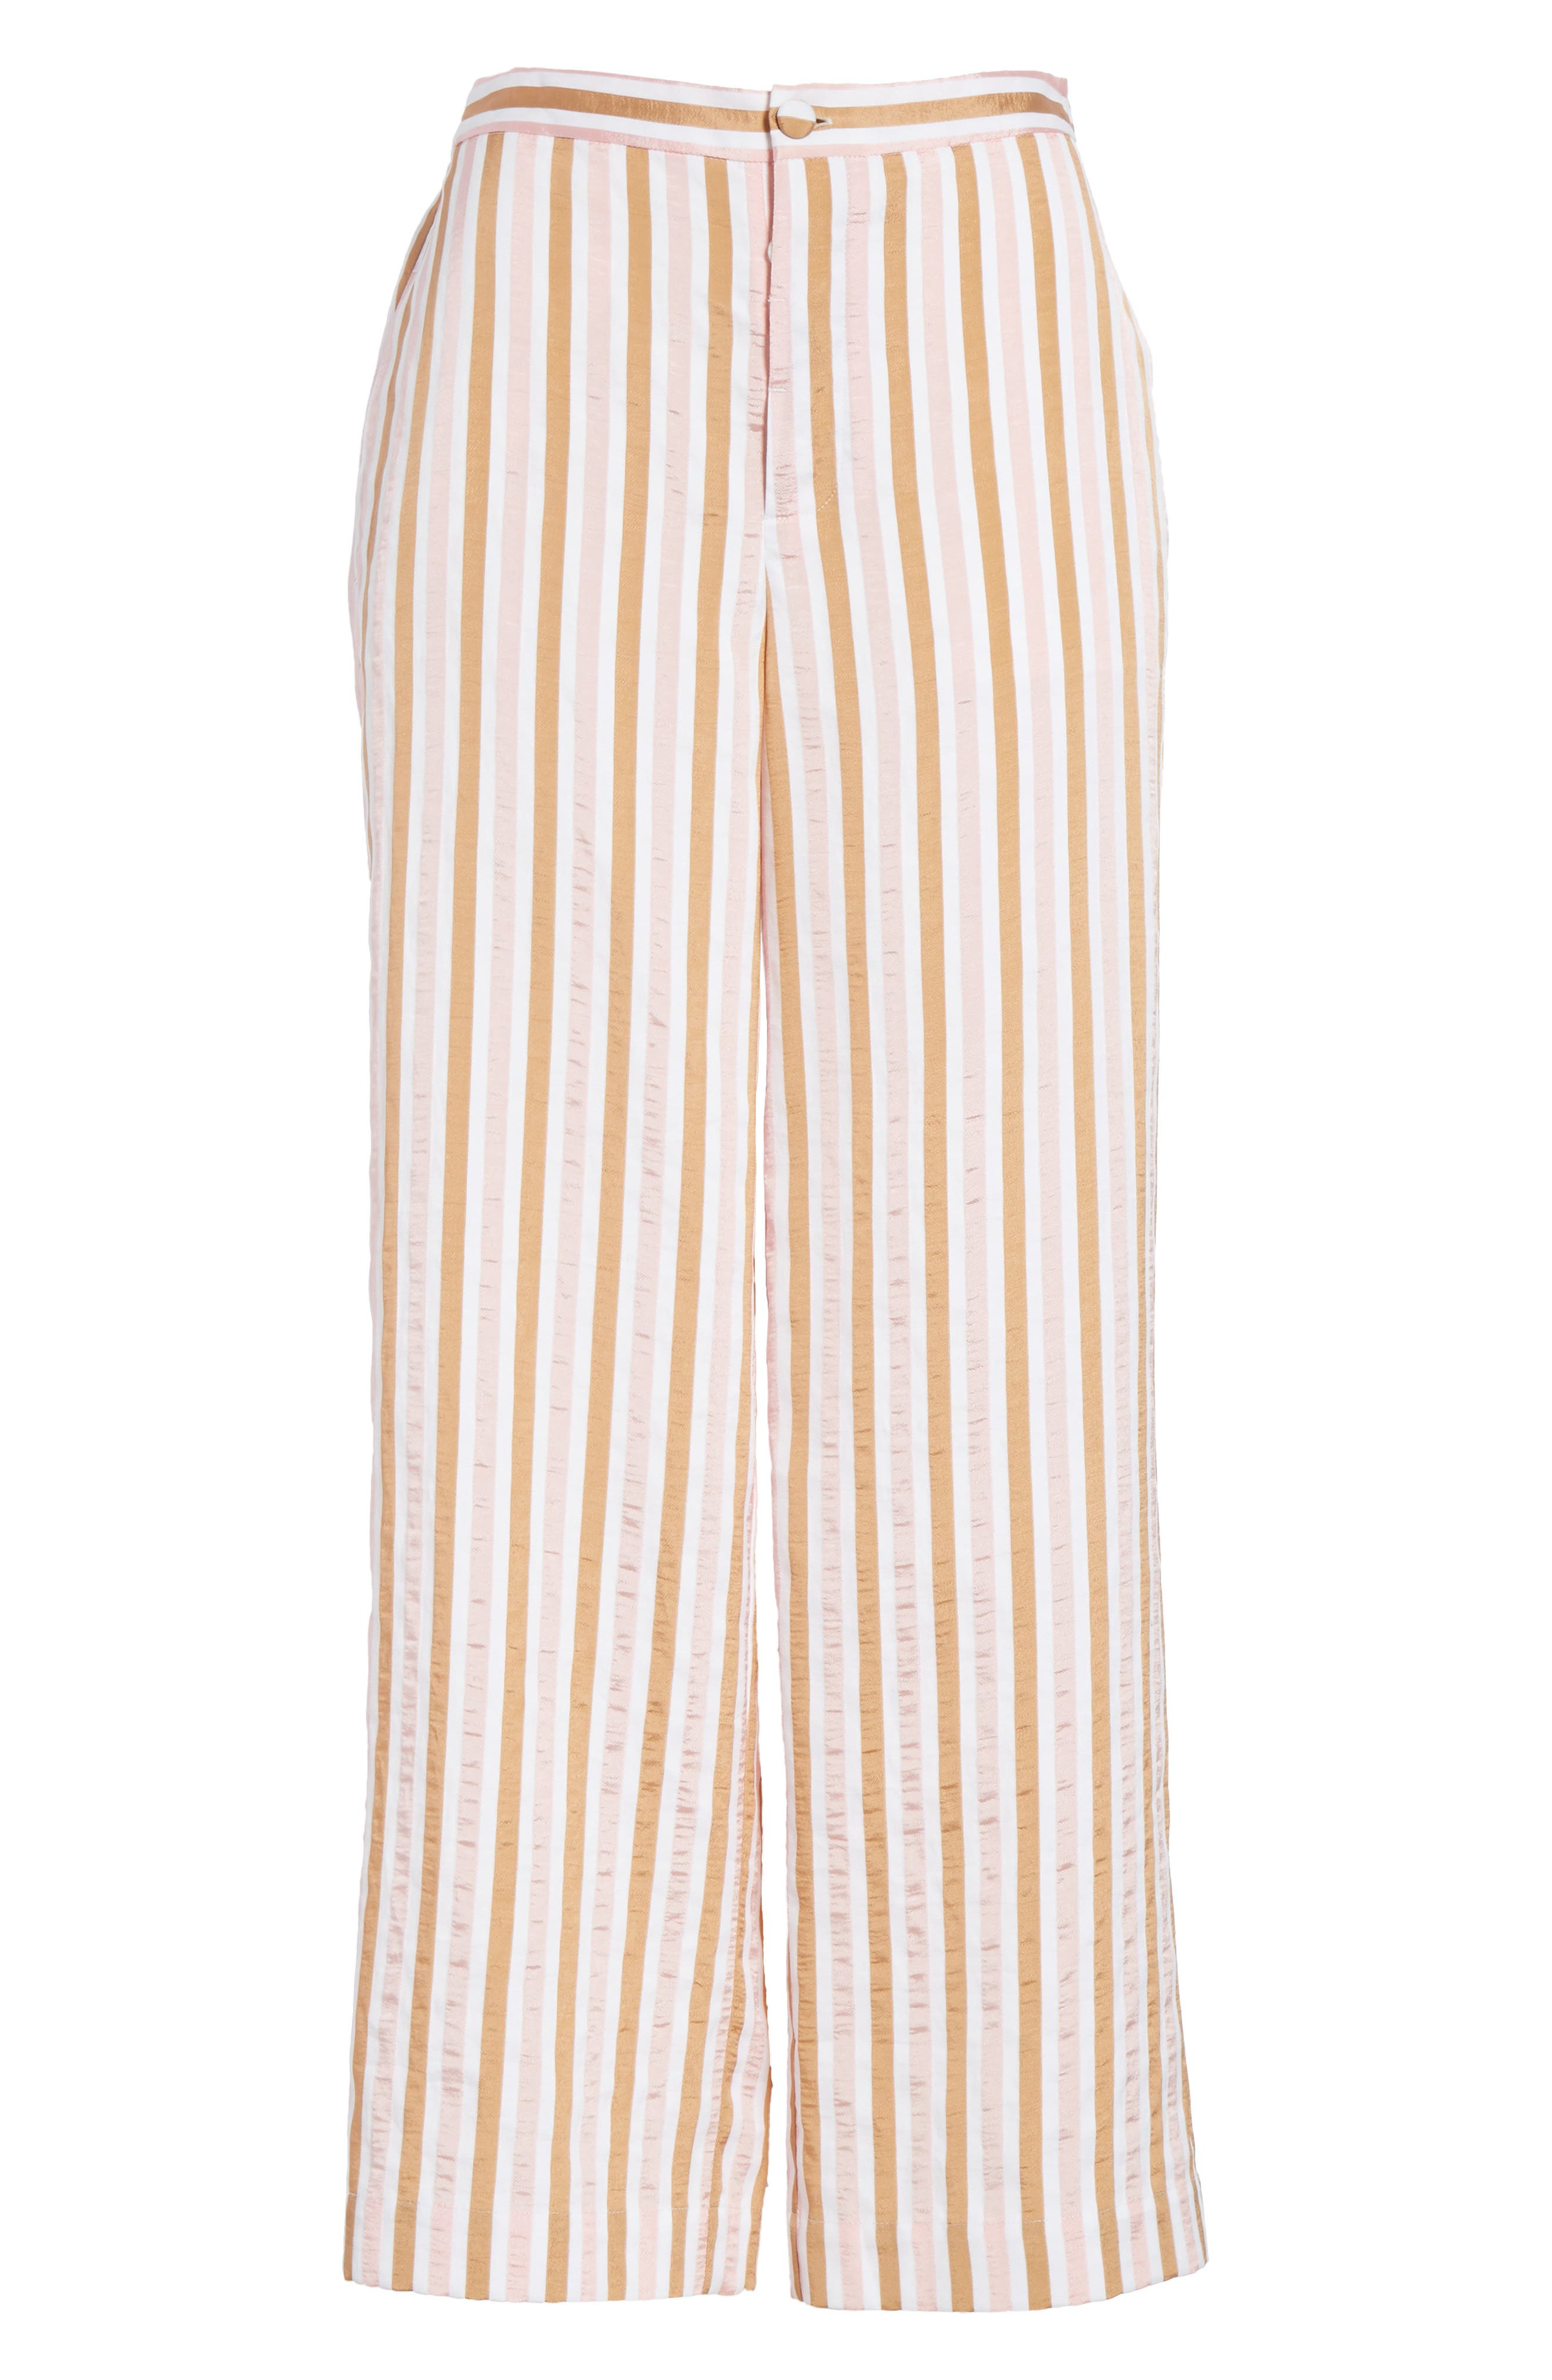 Stripe Relaxed Leg Crop Pants,                             Alternate thumbnail 7, color,                             Copper Multi